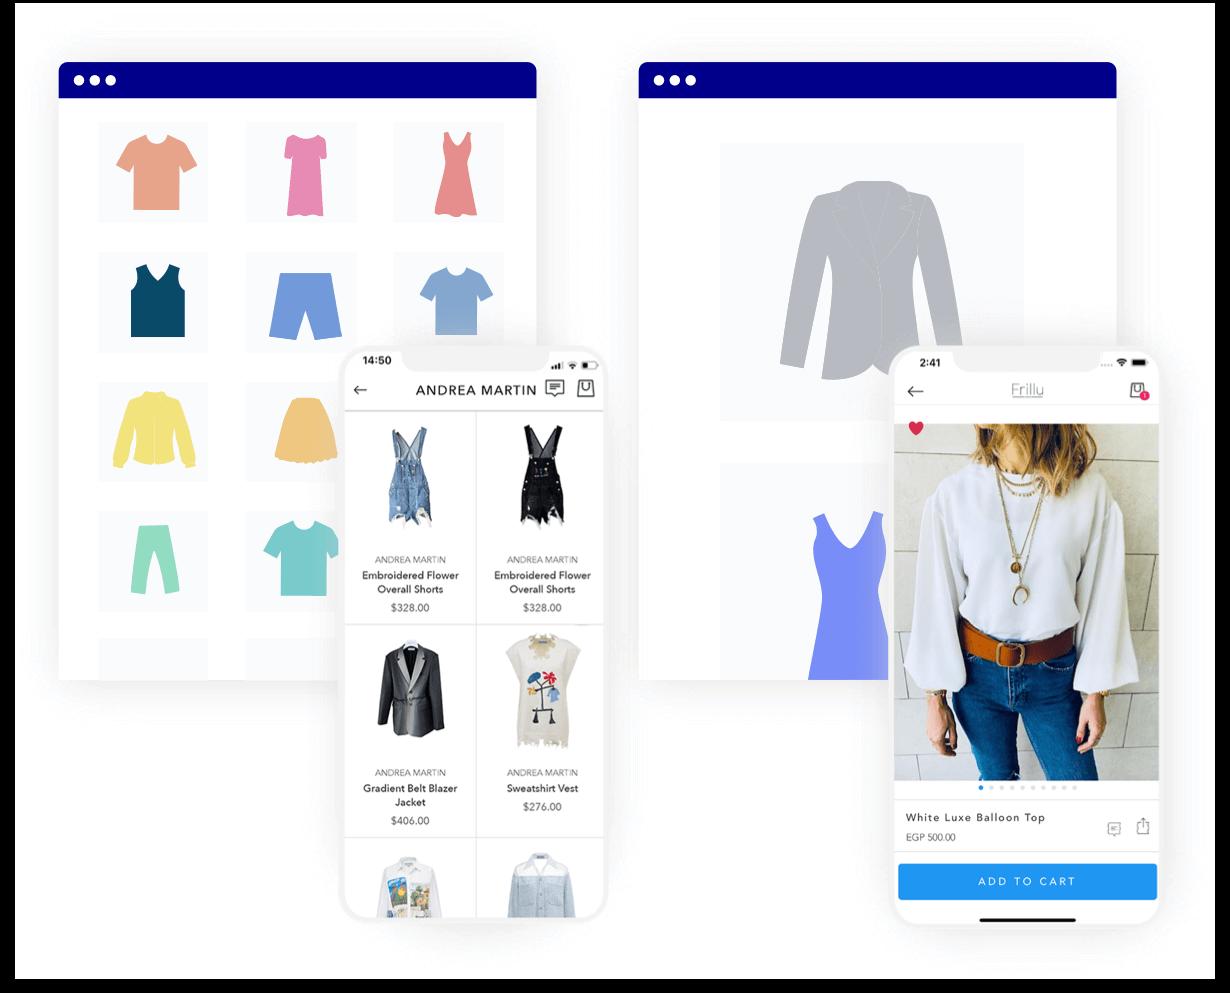 Mobile App Merchandising Options